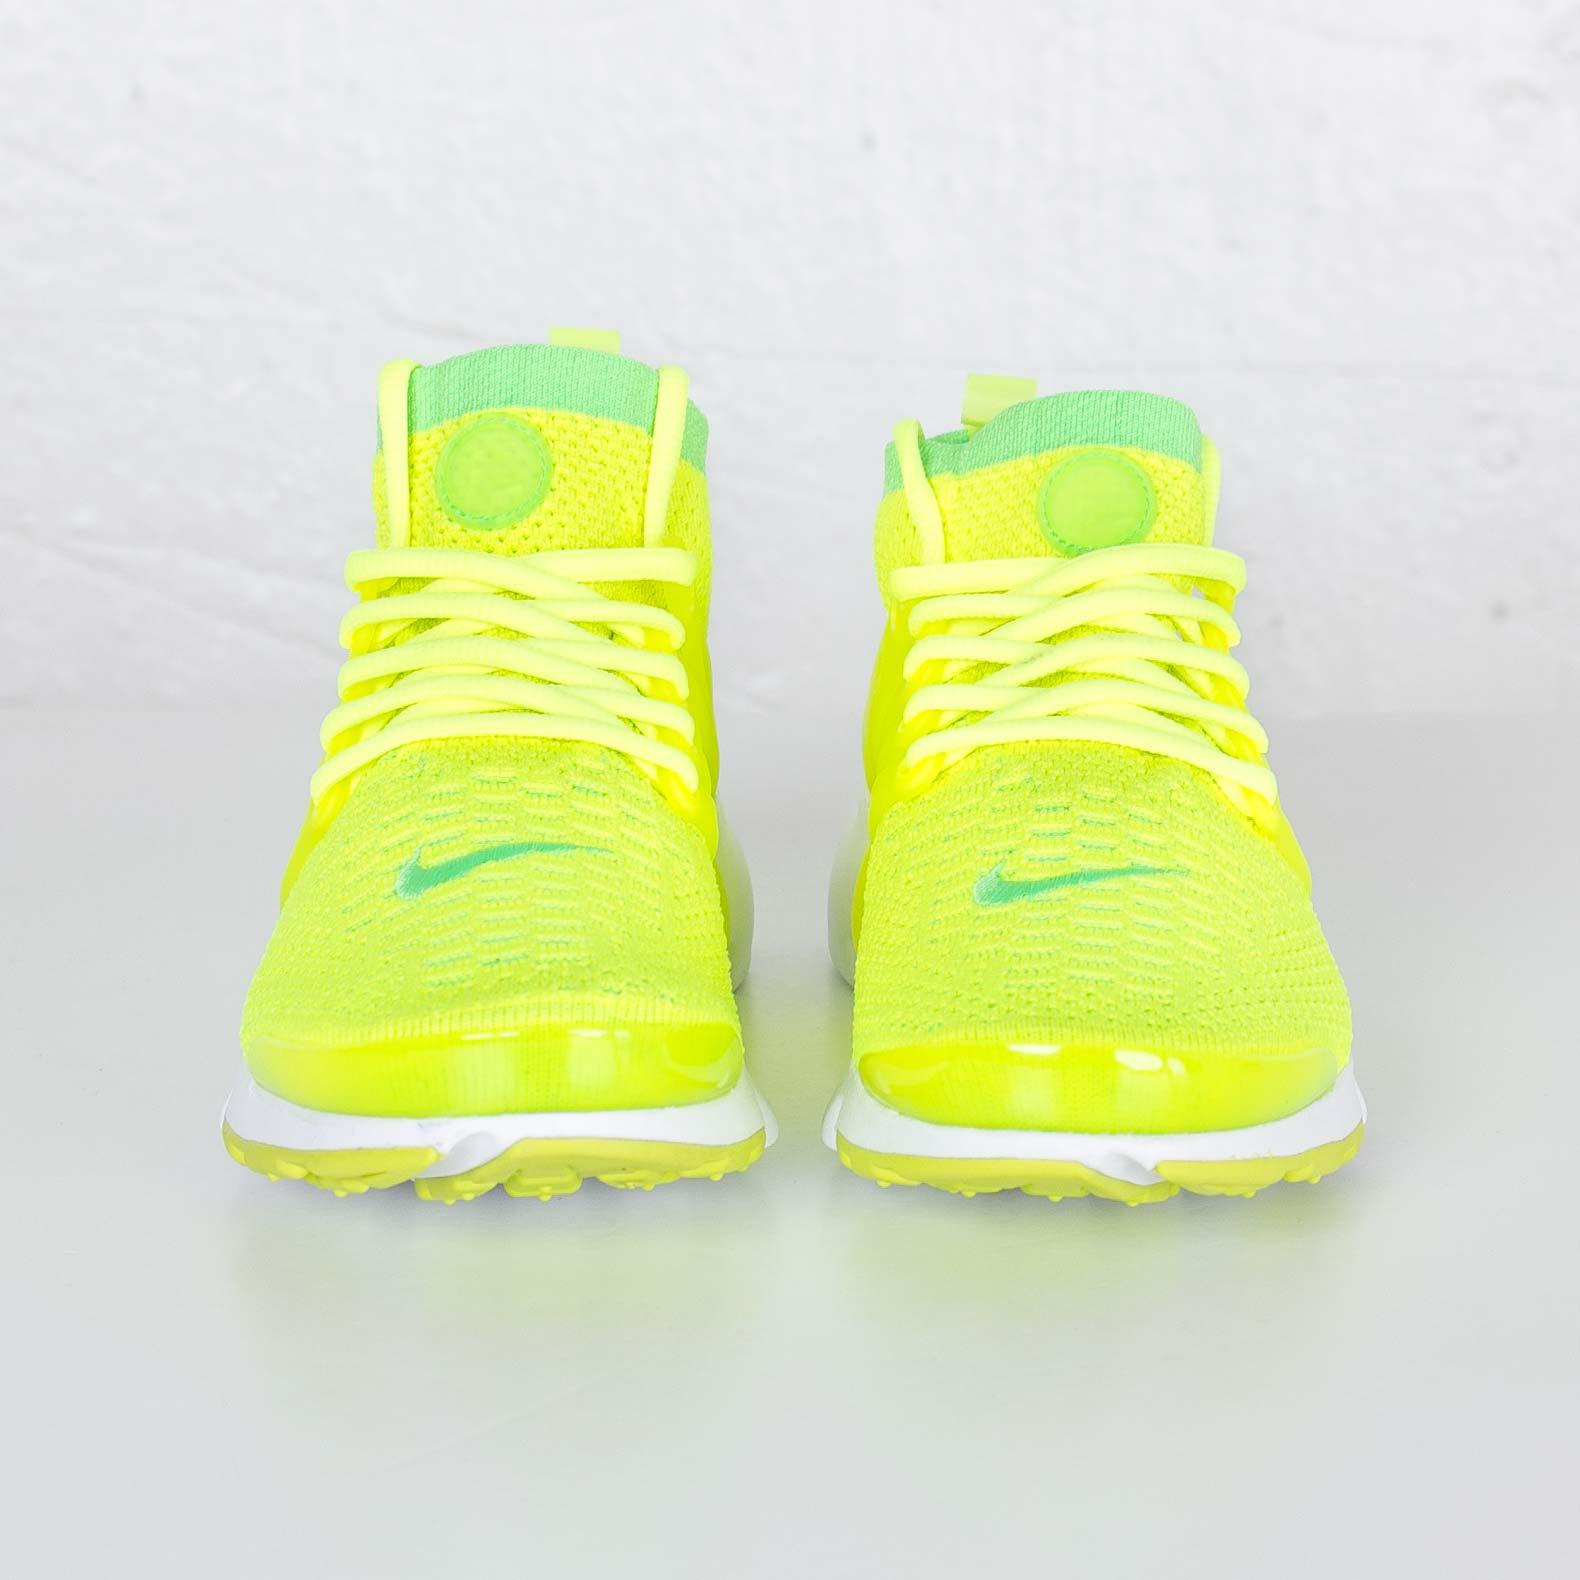 08bff0e55b344 Nike Wmns Air Presto Flyknit Ultra - 835738-300 - Sneakersnstuff ...